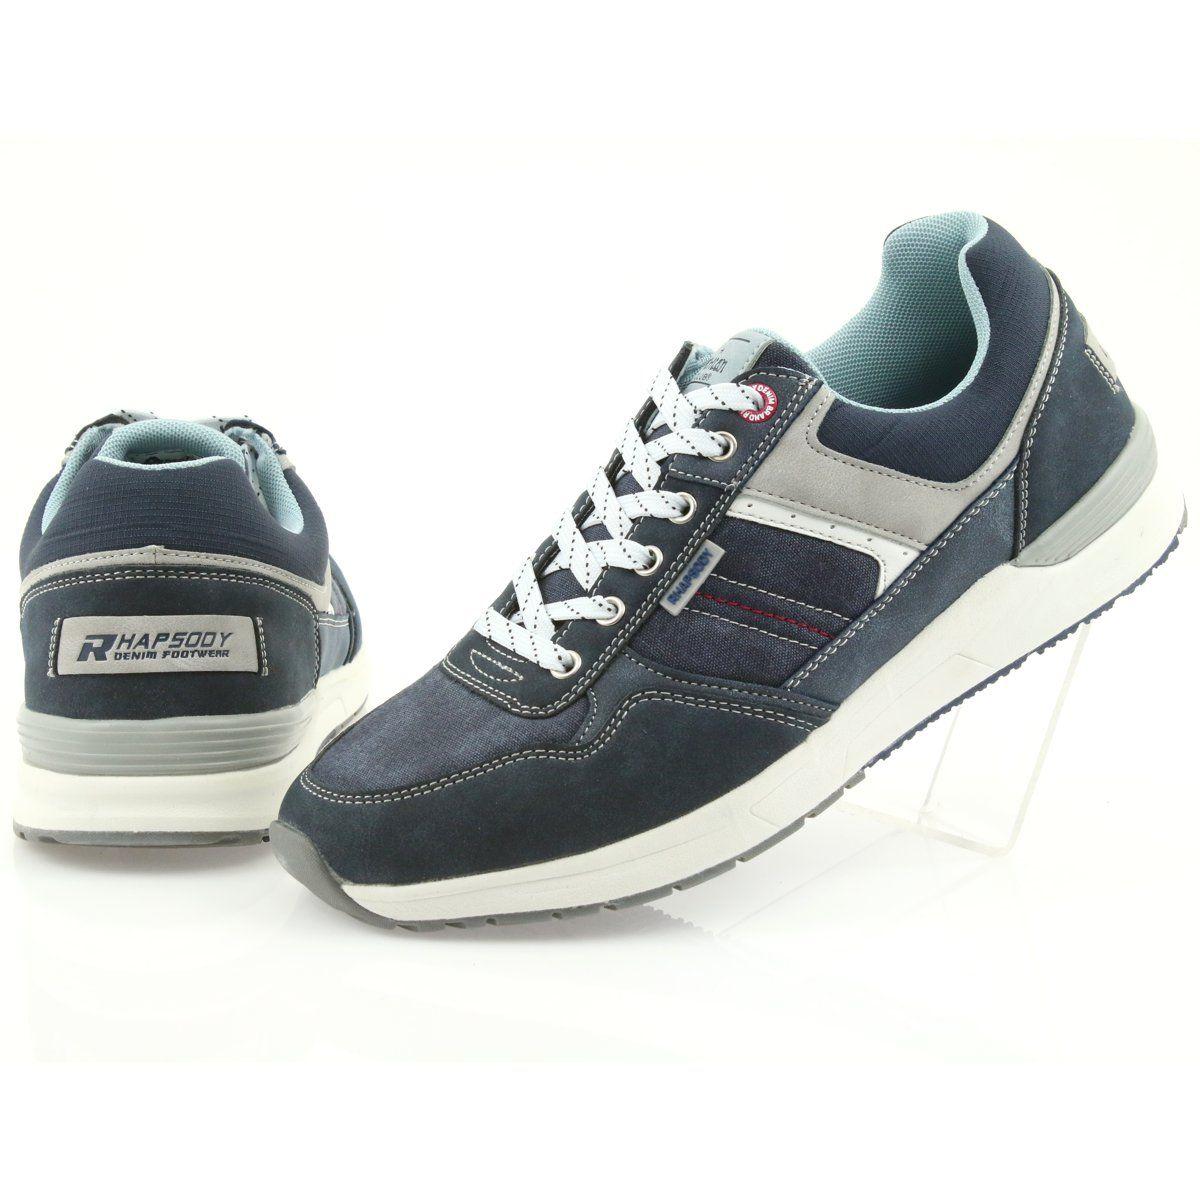 American Club Adi Sportowe Buty Meskie Jeansowe American Rh17 Szare Granatowe Sport Shoes Men Shoes Mens Sport Shoes